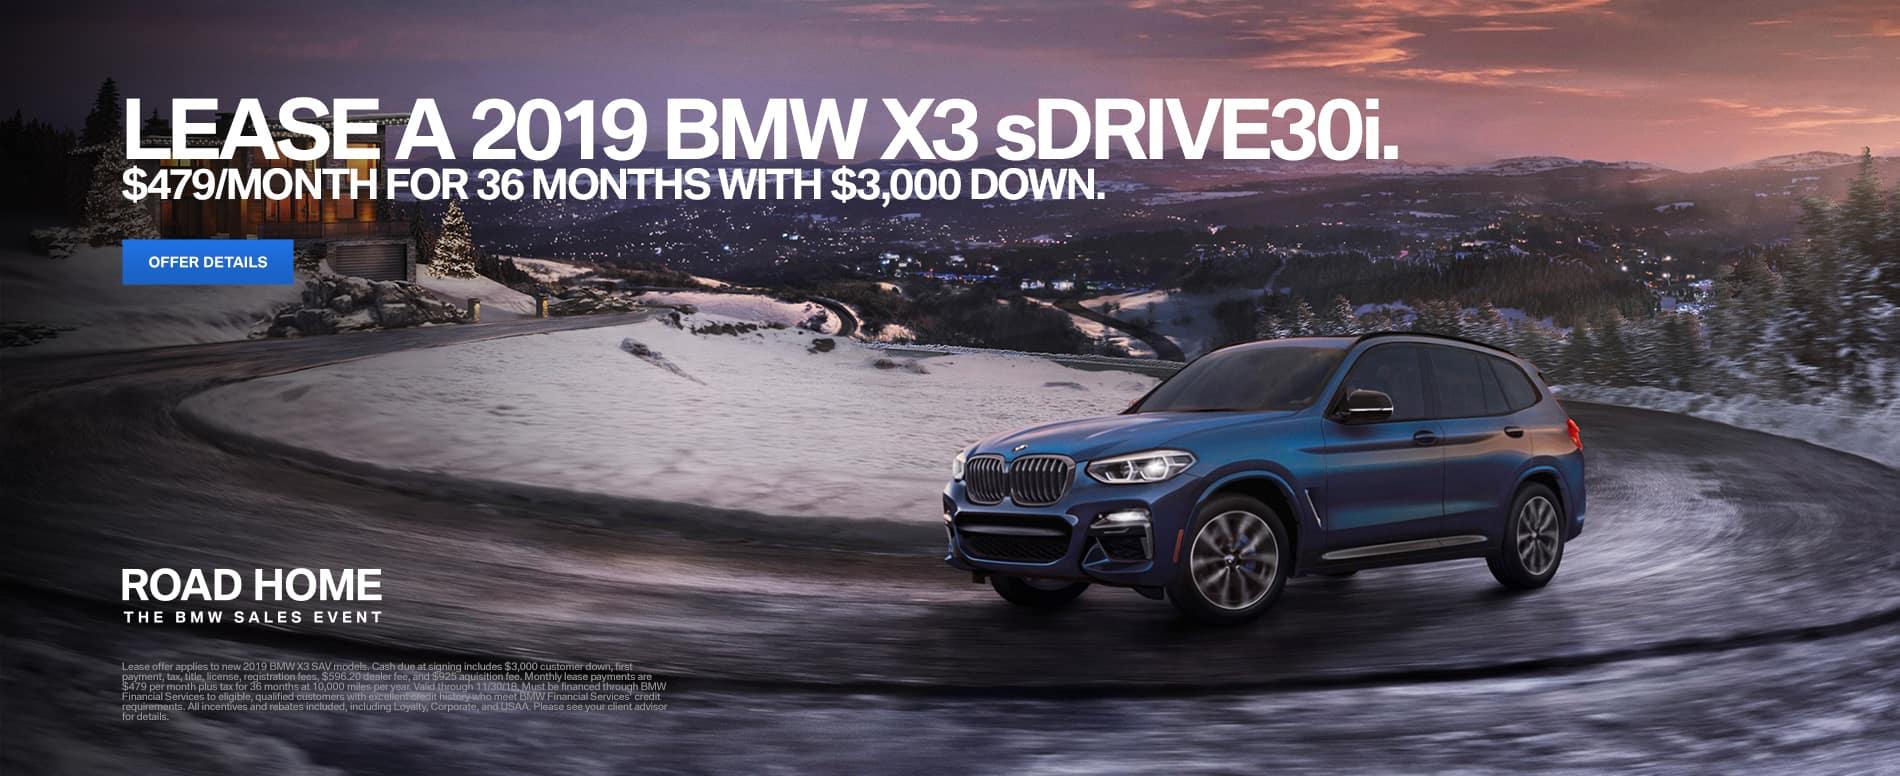 2019 BMW X3 Lease Offer